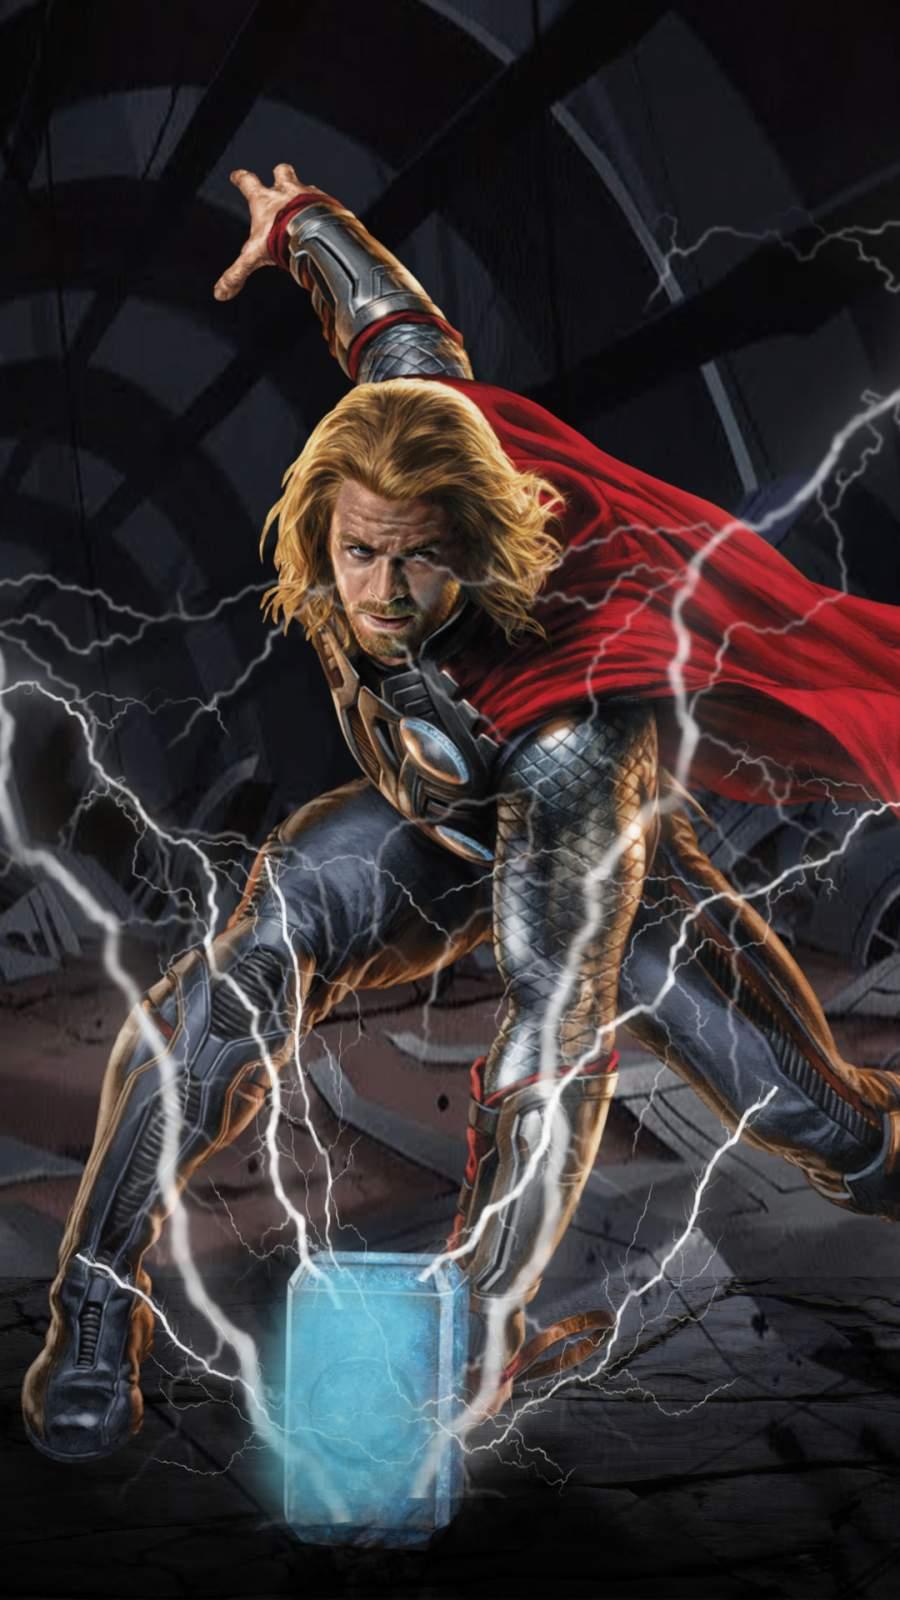 Thor Thunder Art iPhone Wallpaper